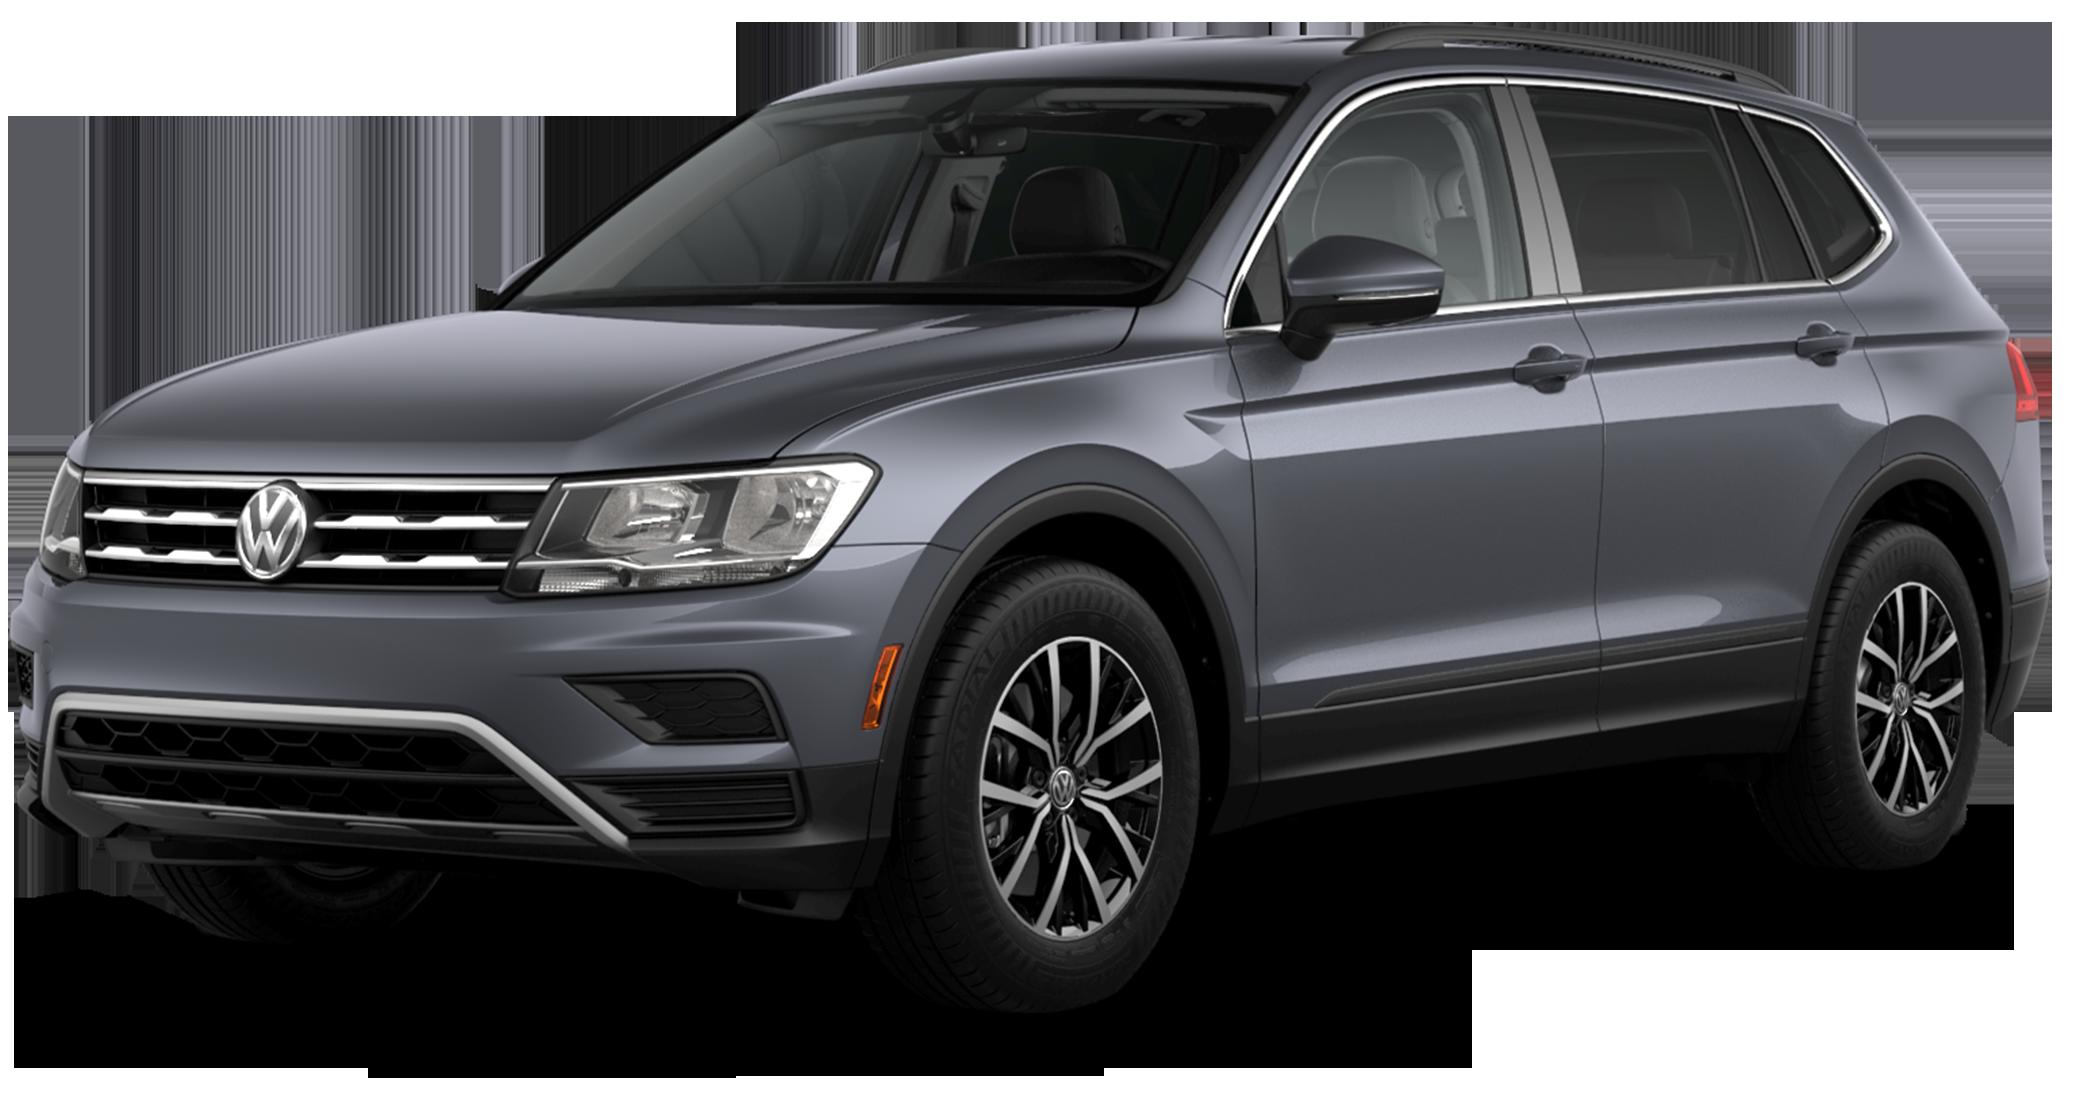 2021 Volkswagen Tiguan Incentives, Specials & Offers in ...